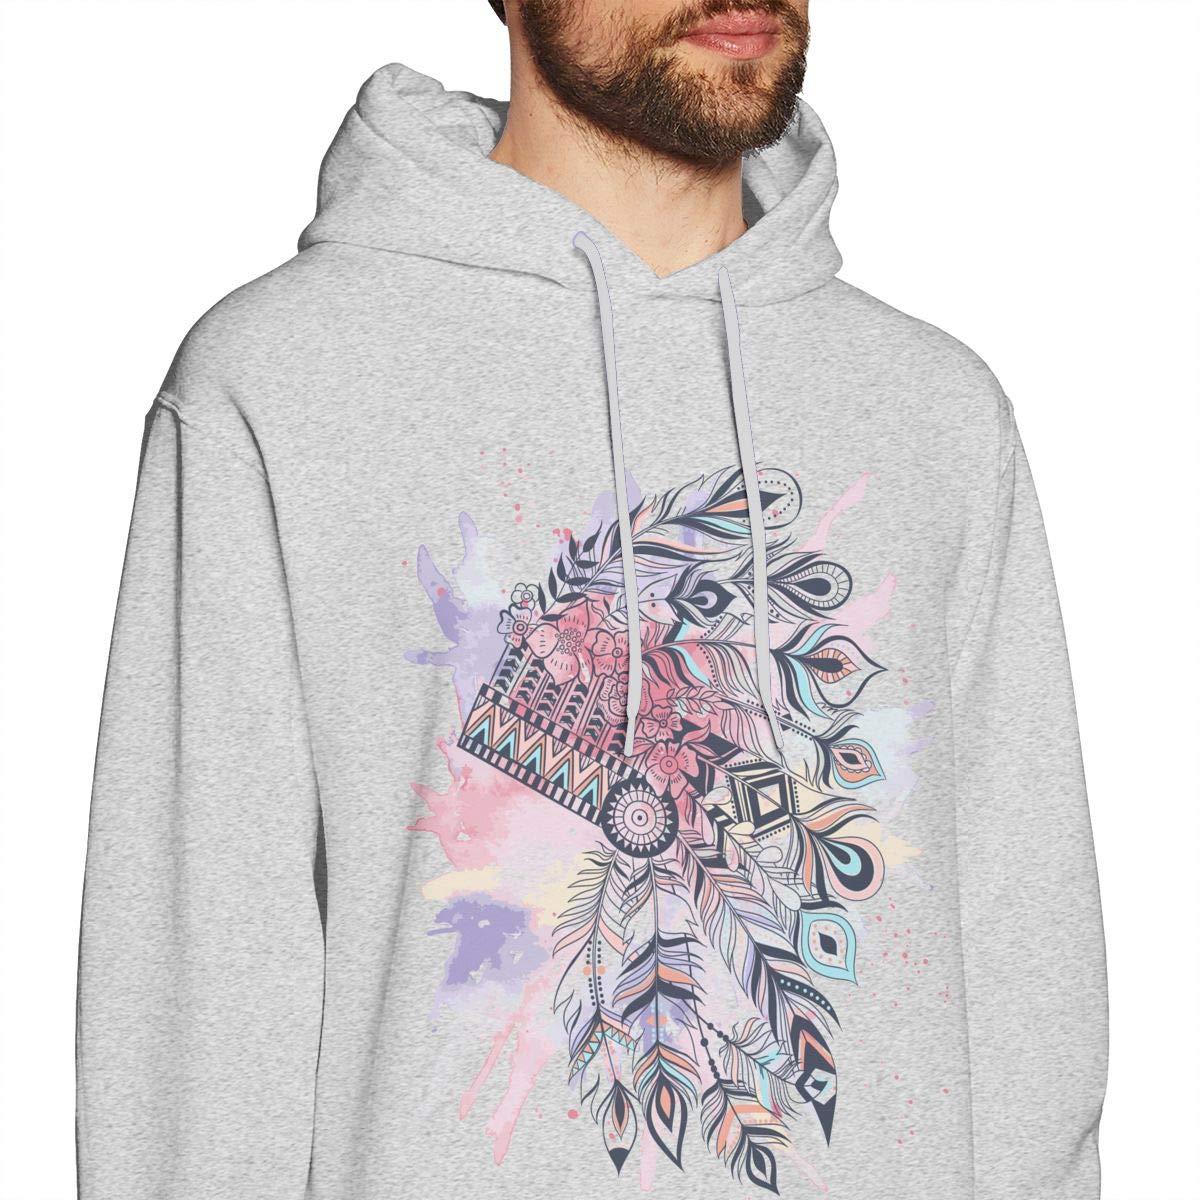 Mans Fashion Pure Color Hoodie Long-Sleeve Drawstring Tribal Headdress Feather Hooded Sweatshirt